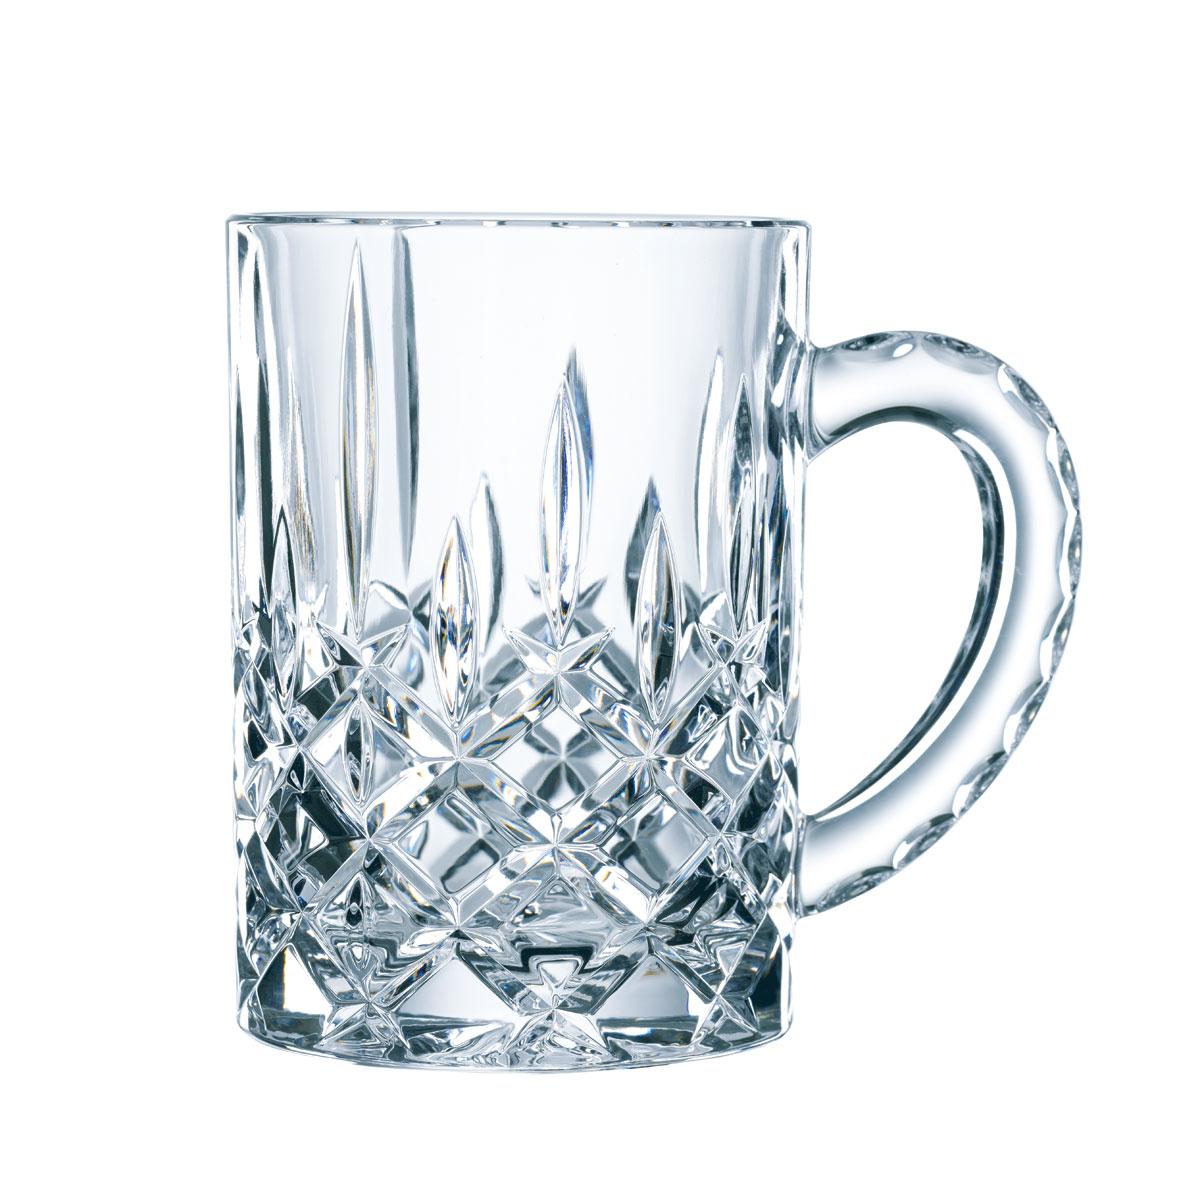 Nachtmann Noblesse Beer Mug, Single